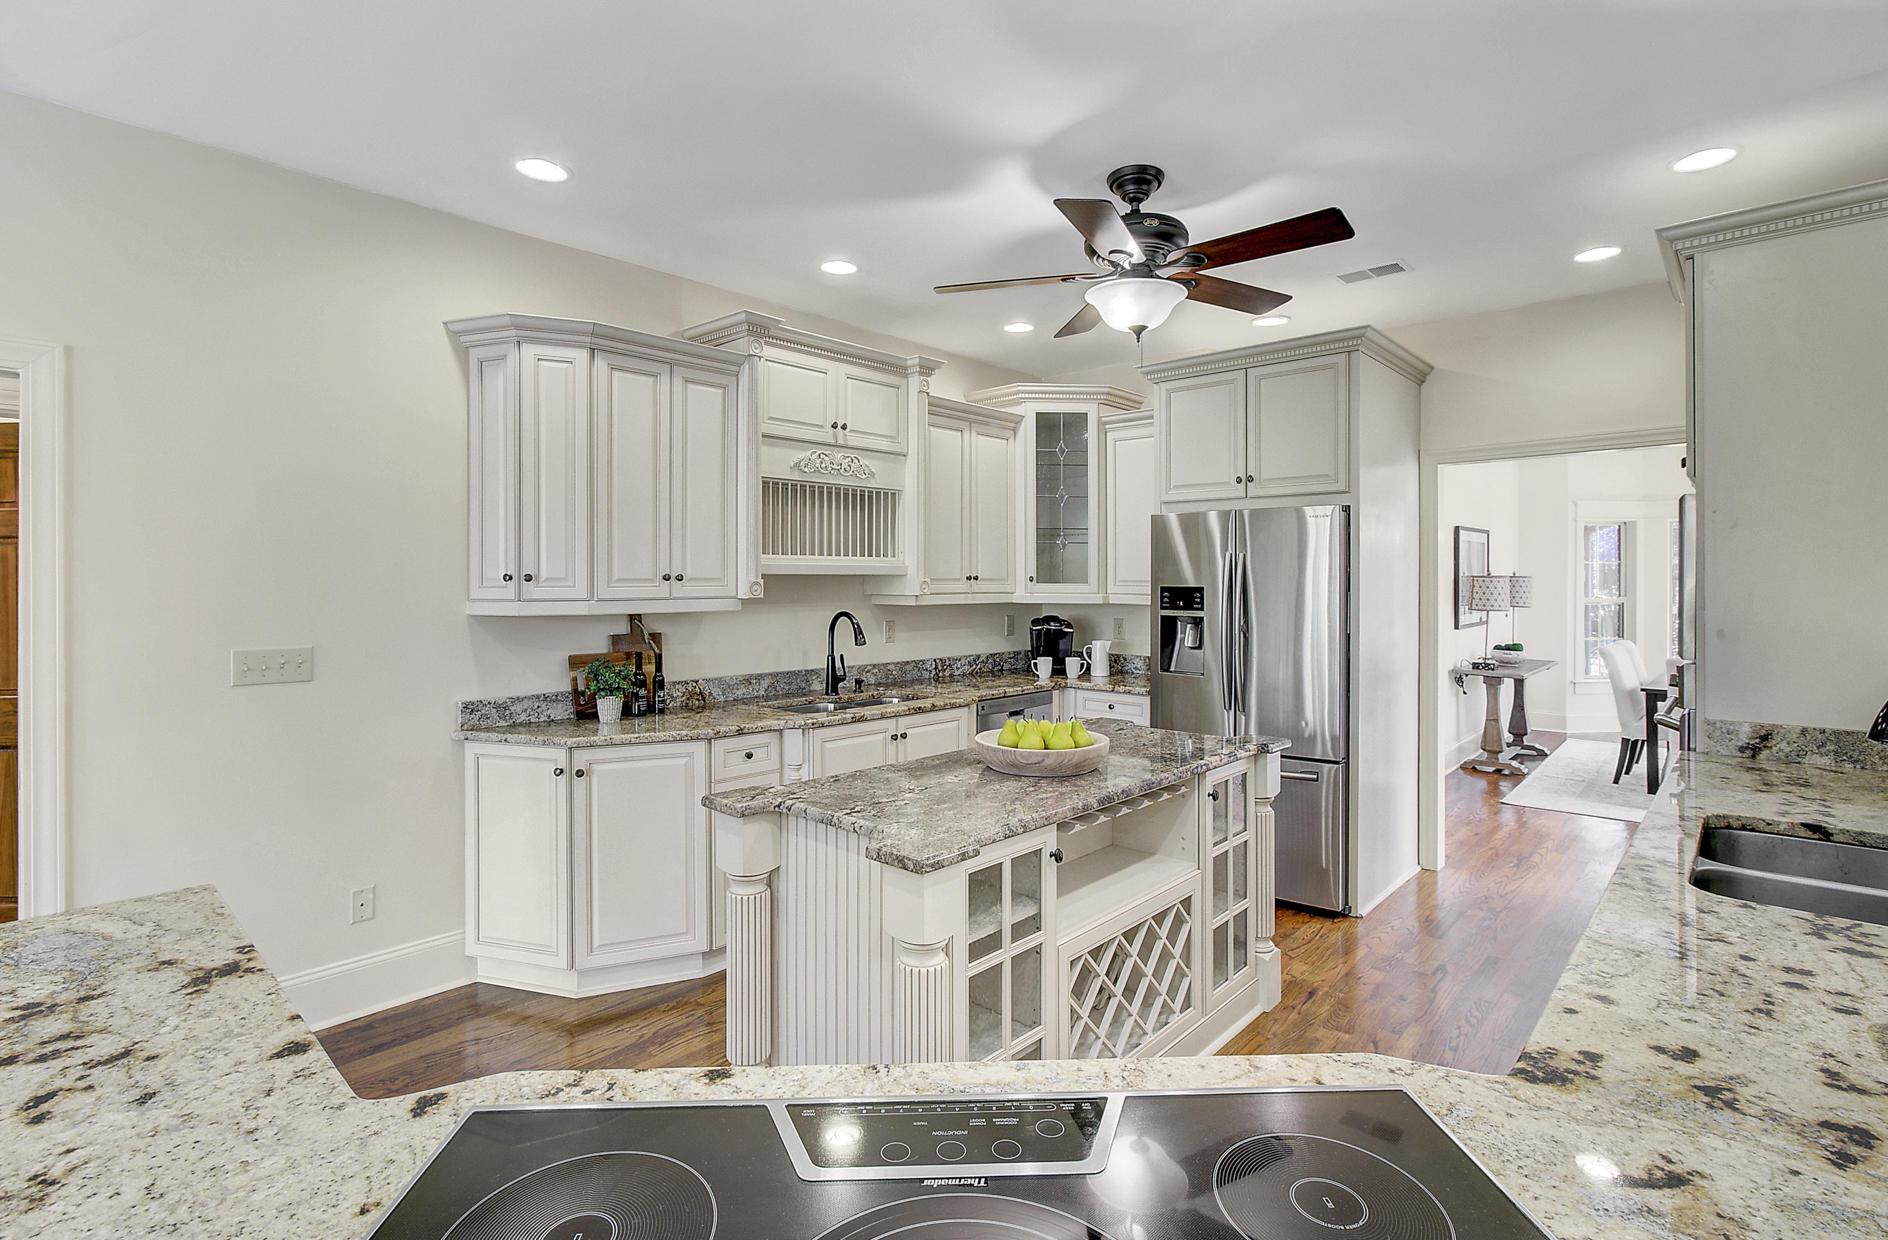 Dunes West Homes For Sale - 4123 Colonel Vanderhorst, Mount Pleasant, SC - 17